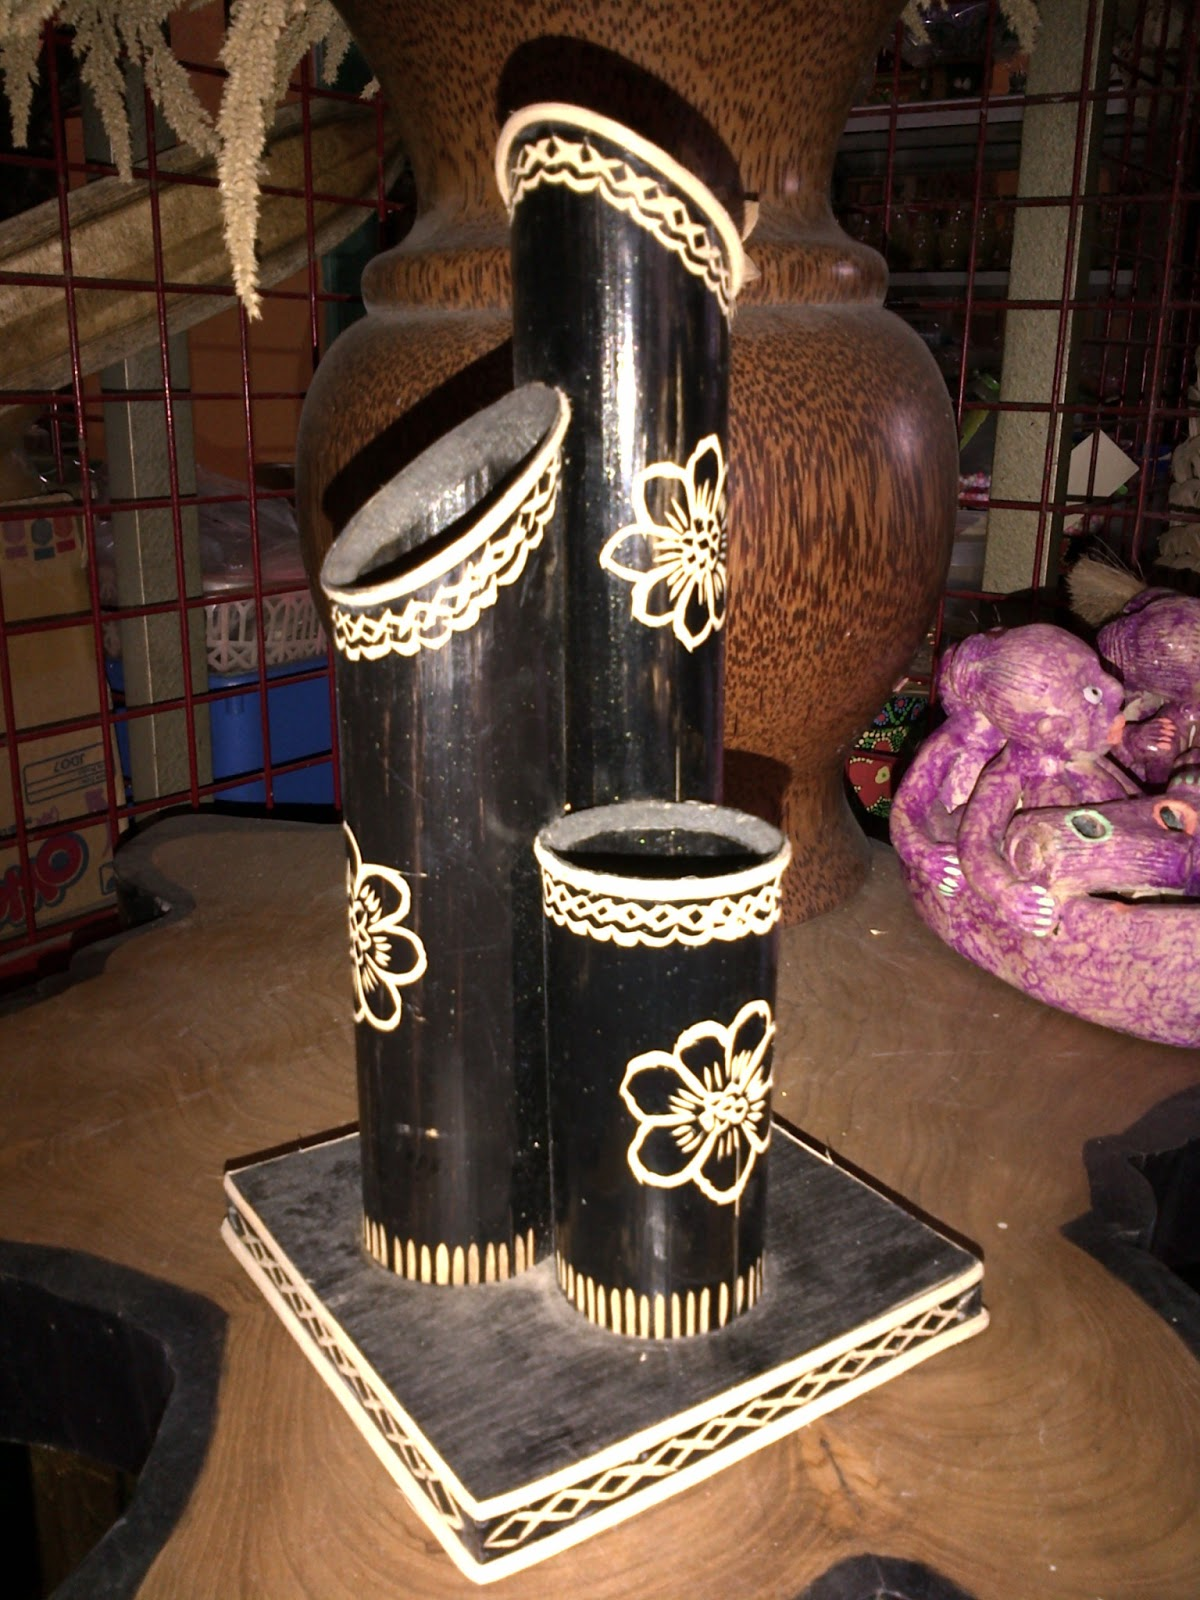 kerajinan bahan keras(bambu) - Jangan diliat